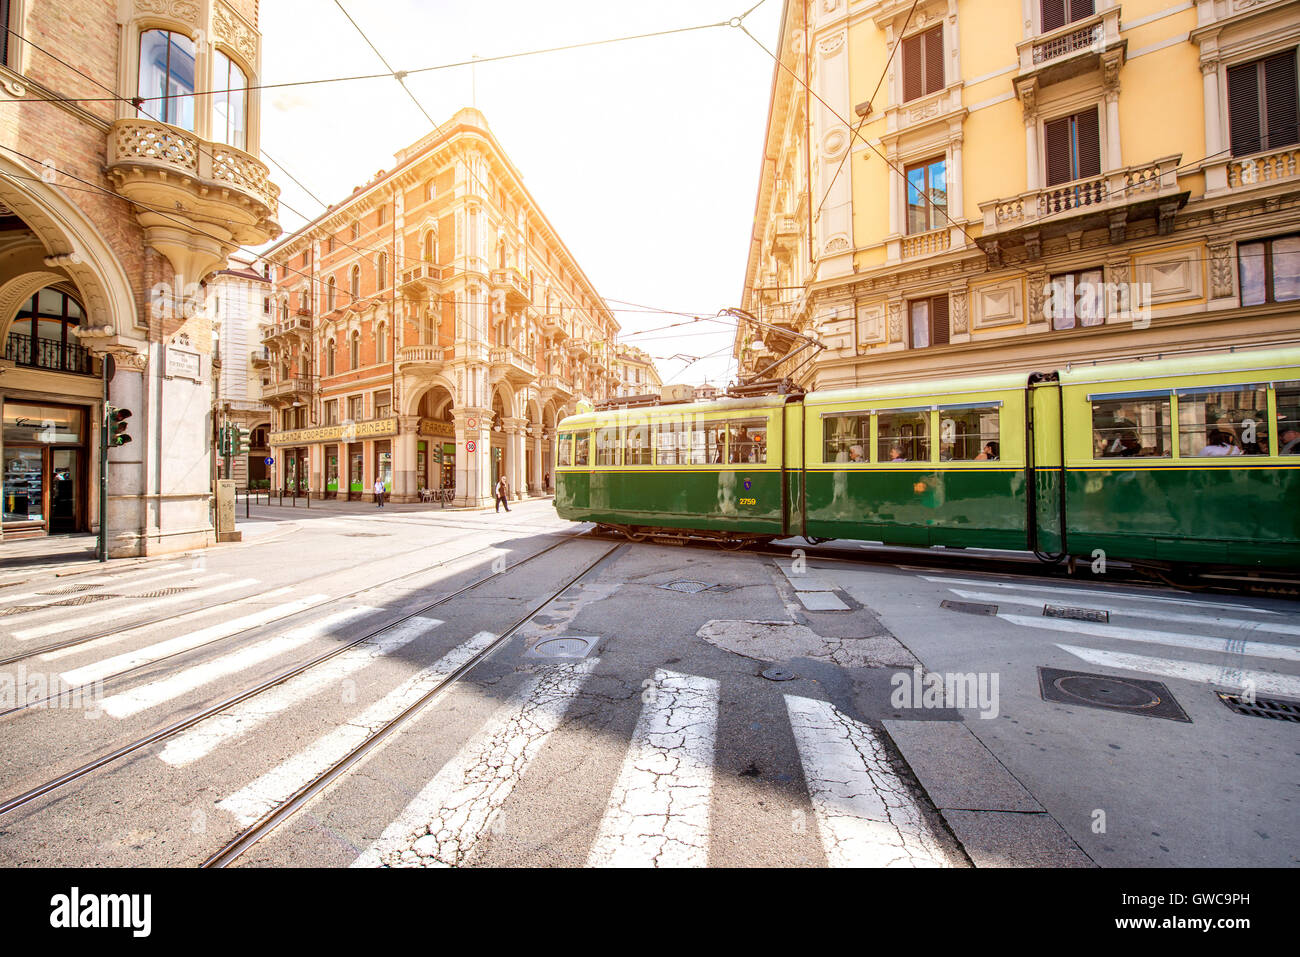 La ciudad de Turín en Italia Foto de stock